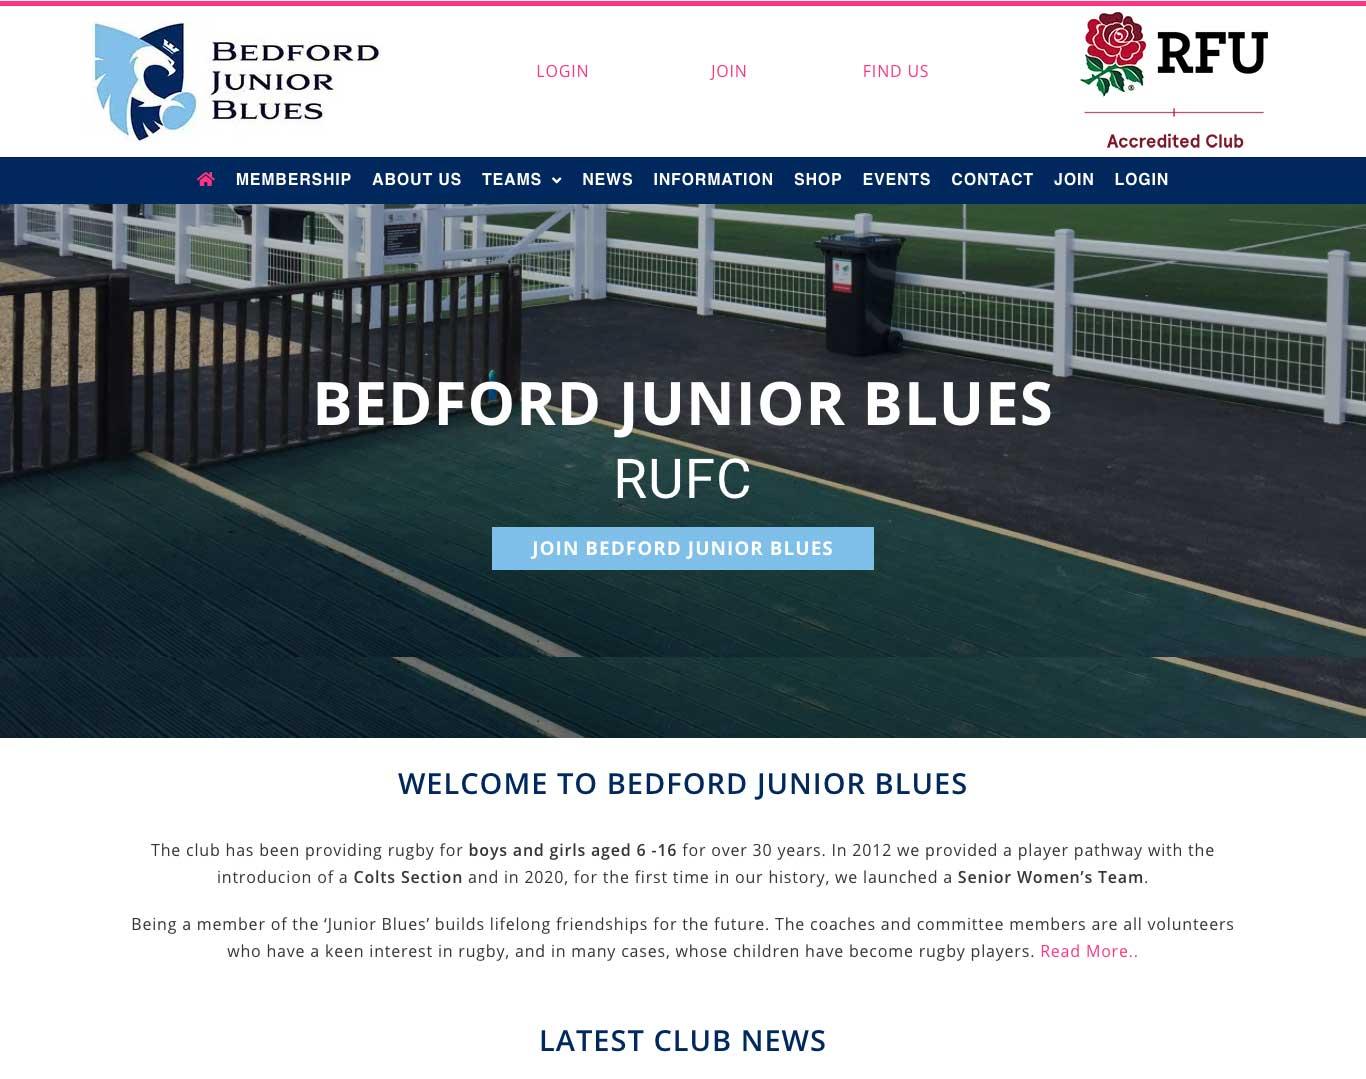 Bedford Junior Blues Website